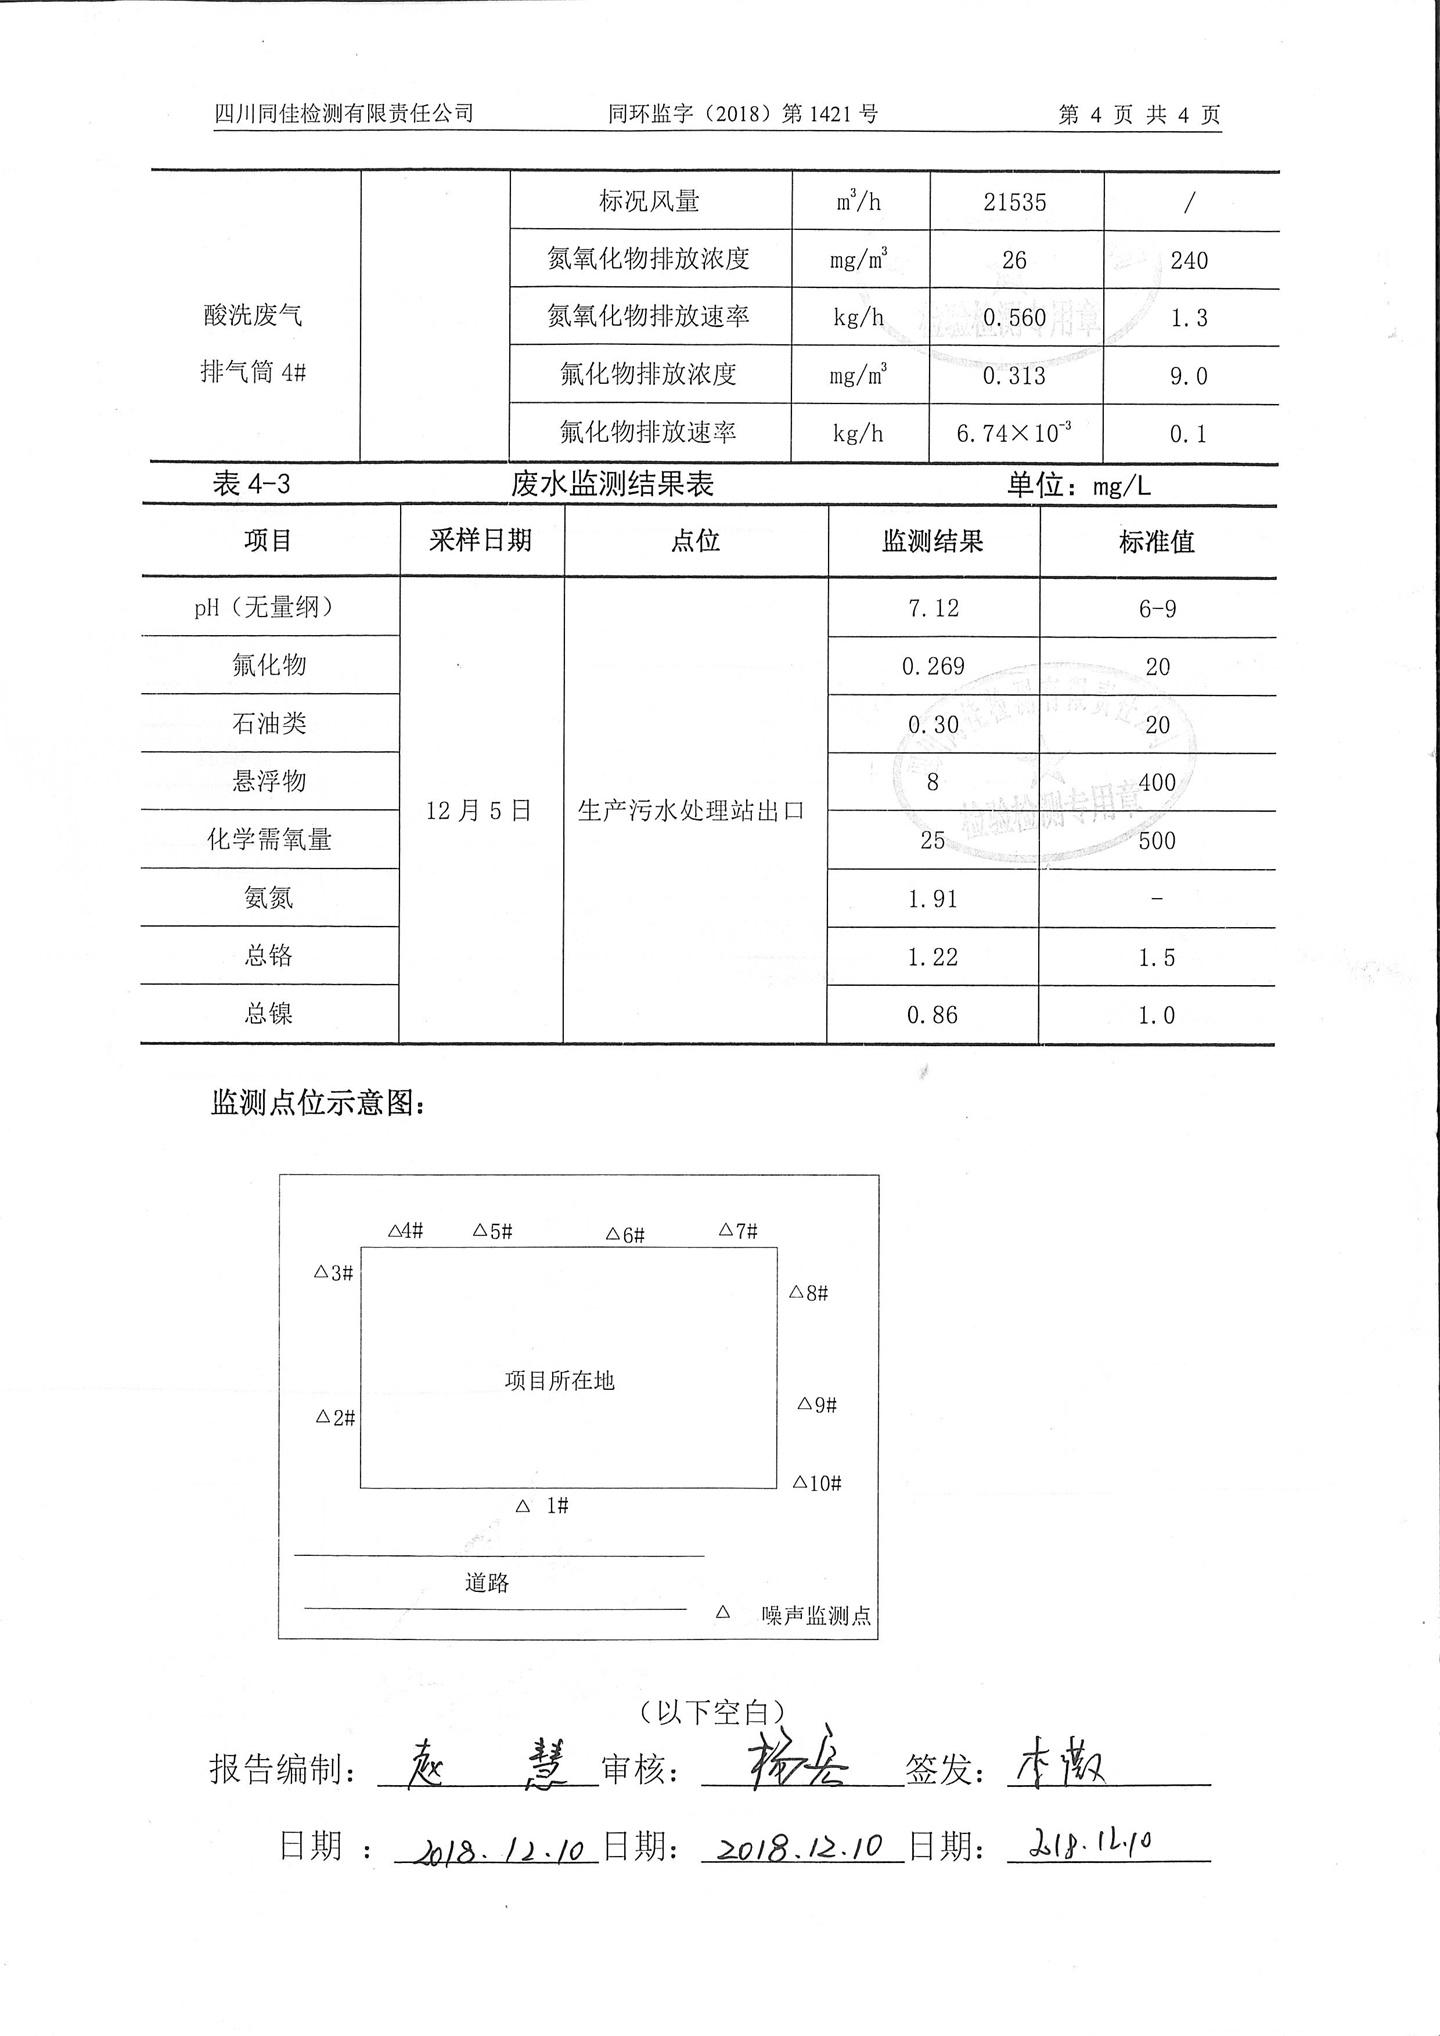 http://qiniu.cloudhong.com/image_2019-01-22_5c46188c4ec0a.jpg